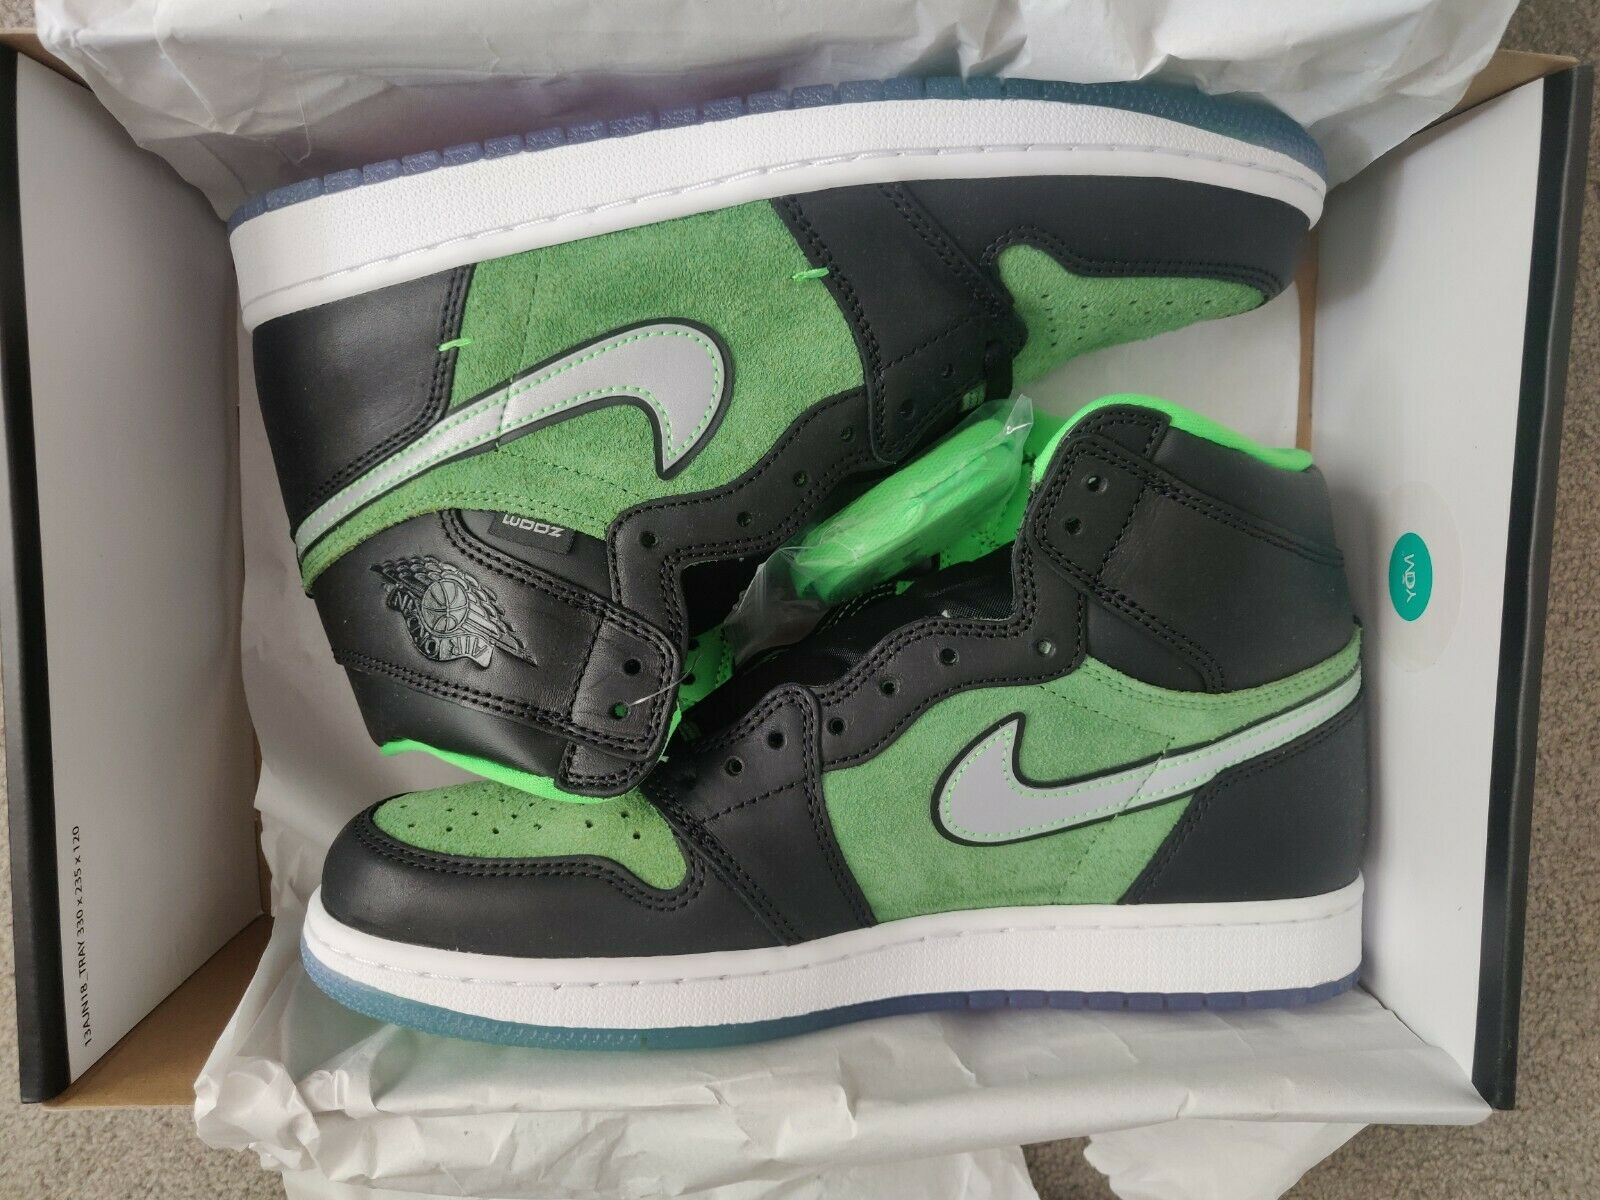 Jordan 1 Retro High Zoom Black Green UK 8.5 -Brand New